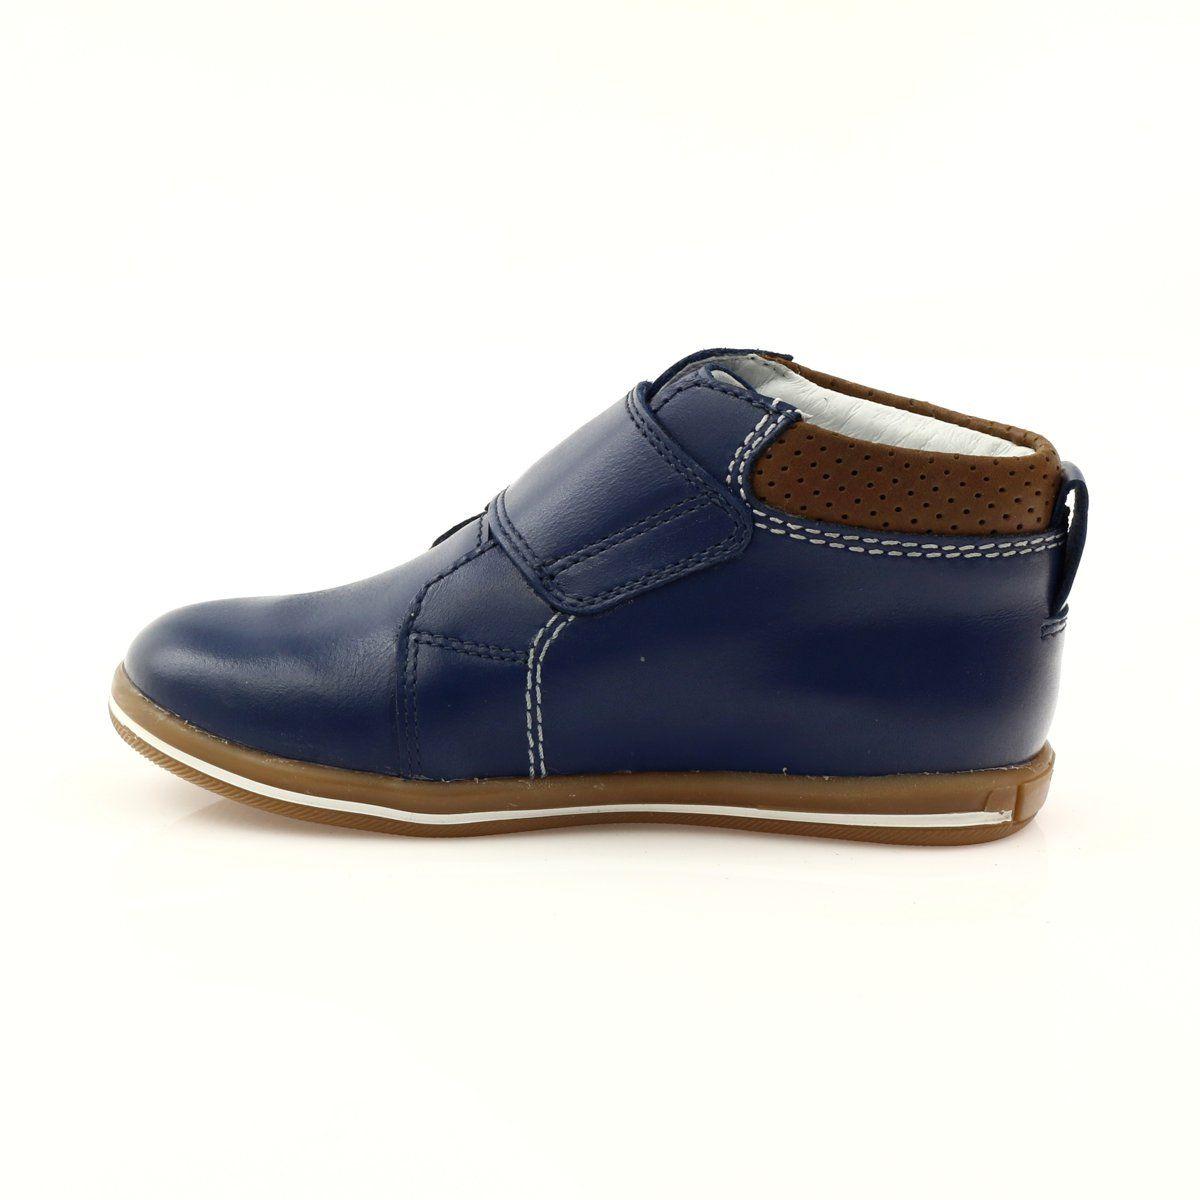 Velcro Closure Boots Bartek 31829 Navy Blue Brown Boots Childrens Shoes Low Boots